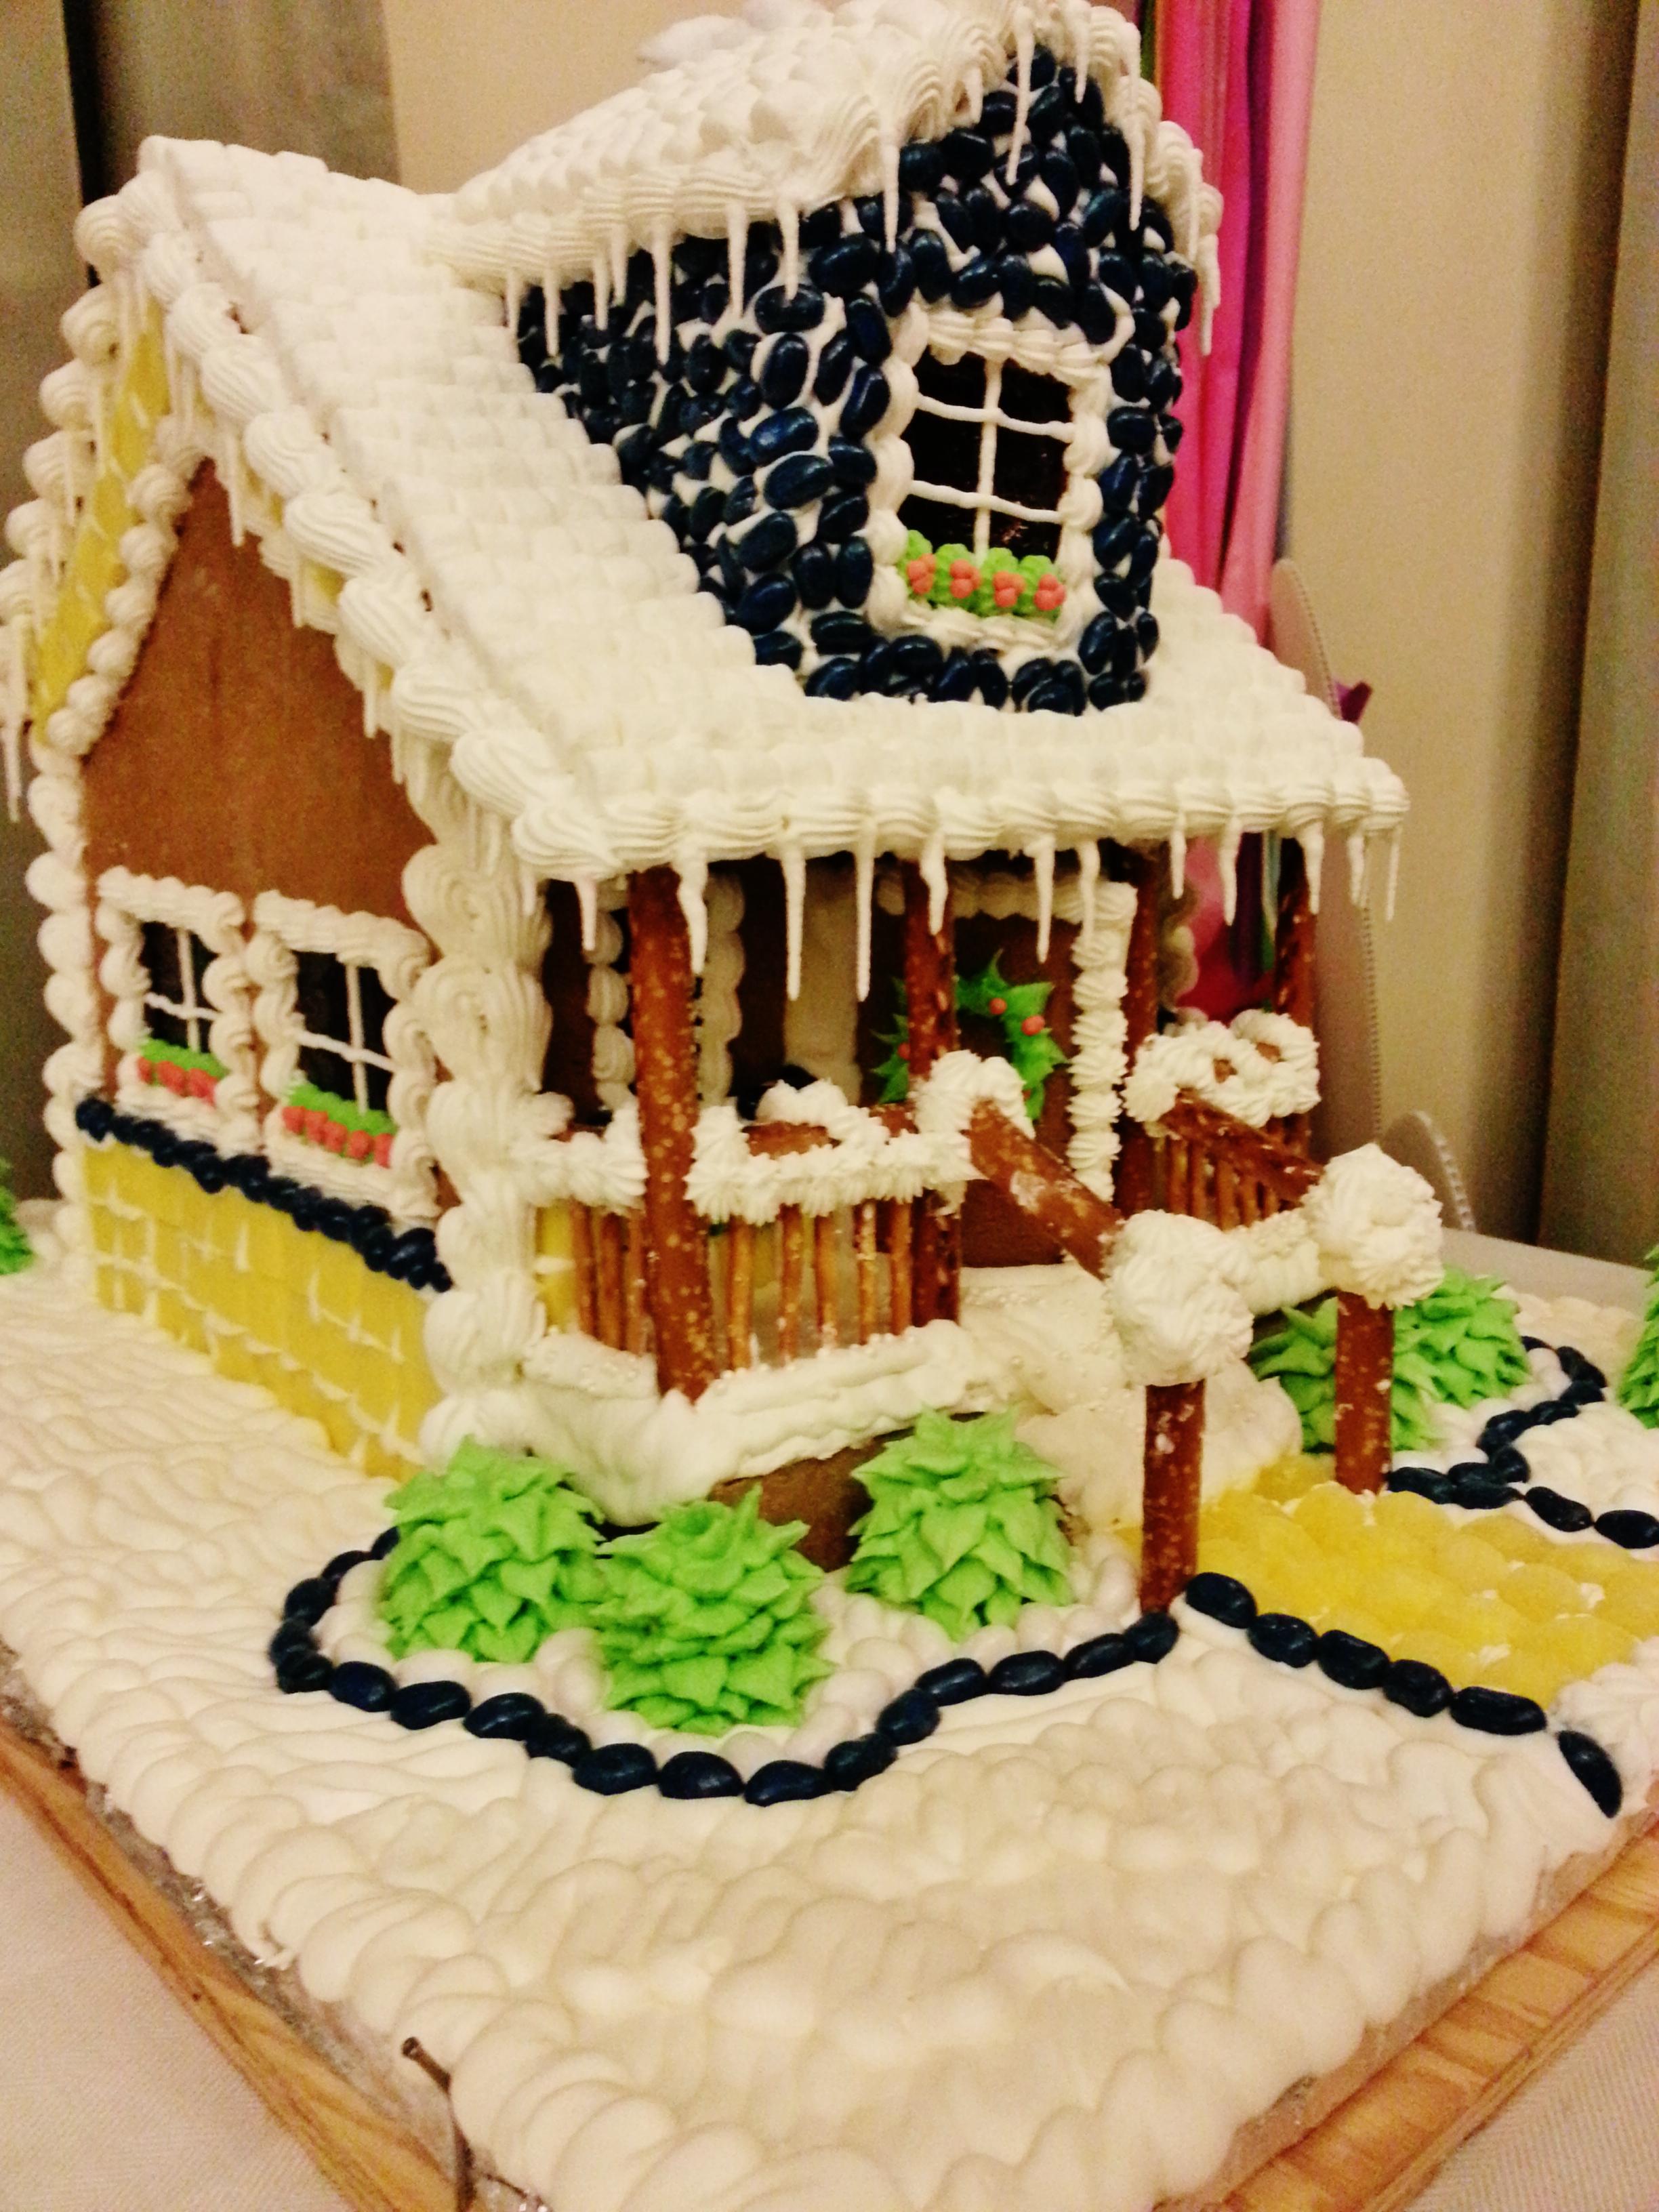 Contemporary Gingerbread House Ideas Gingerbread House Ideas Gingerbread House Ideas Martha Stewart Opia200911gingerbread House Ideas ideas Gingerbread House Ideas